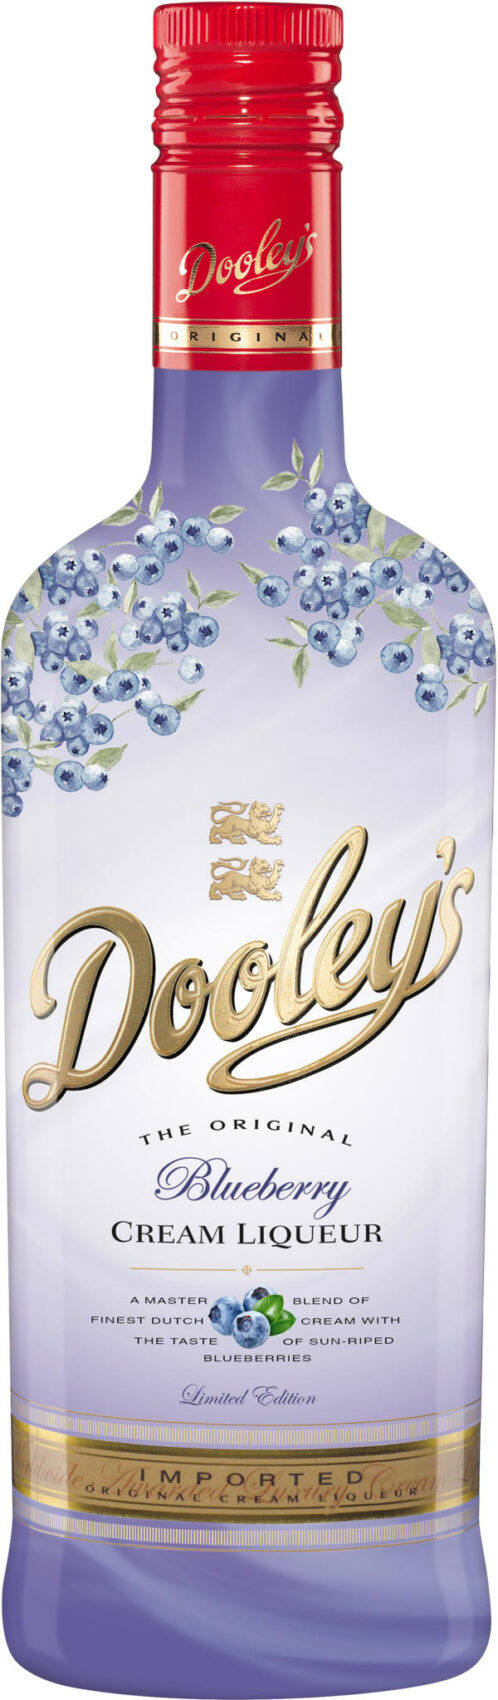 dooleys-blueberry-cream-liqueur